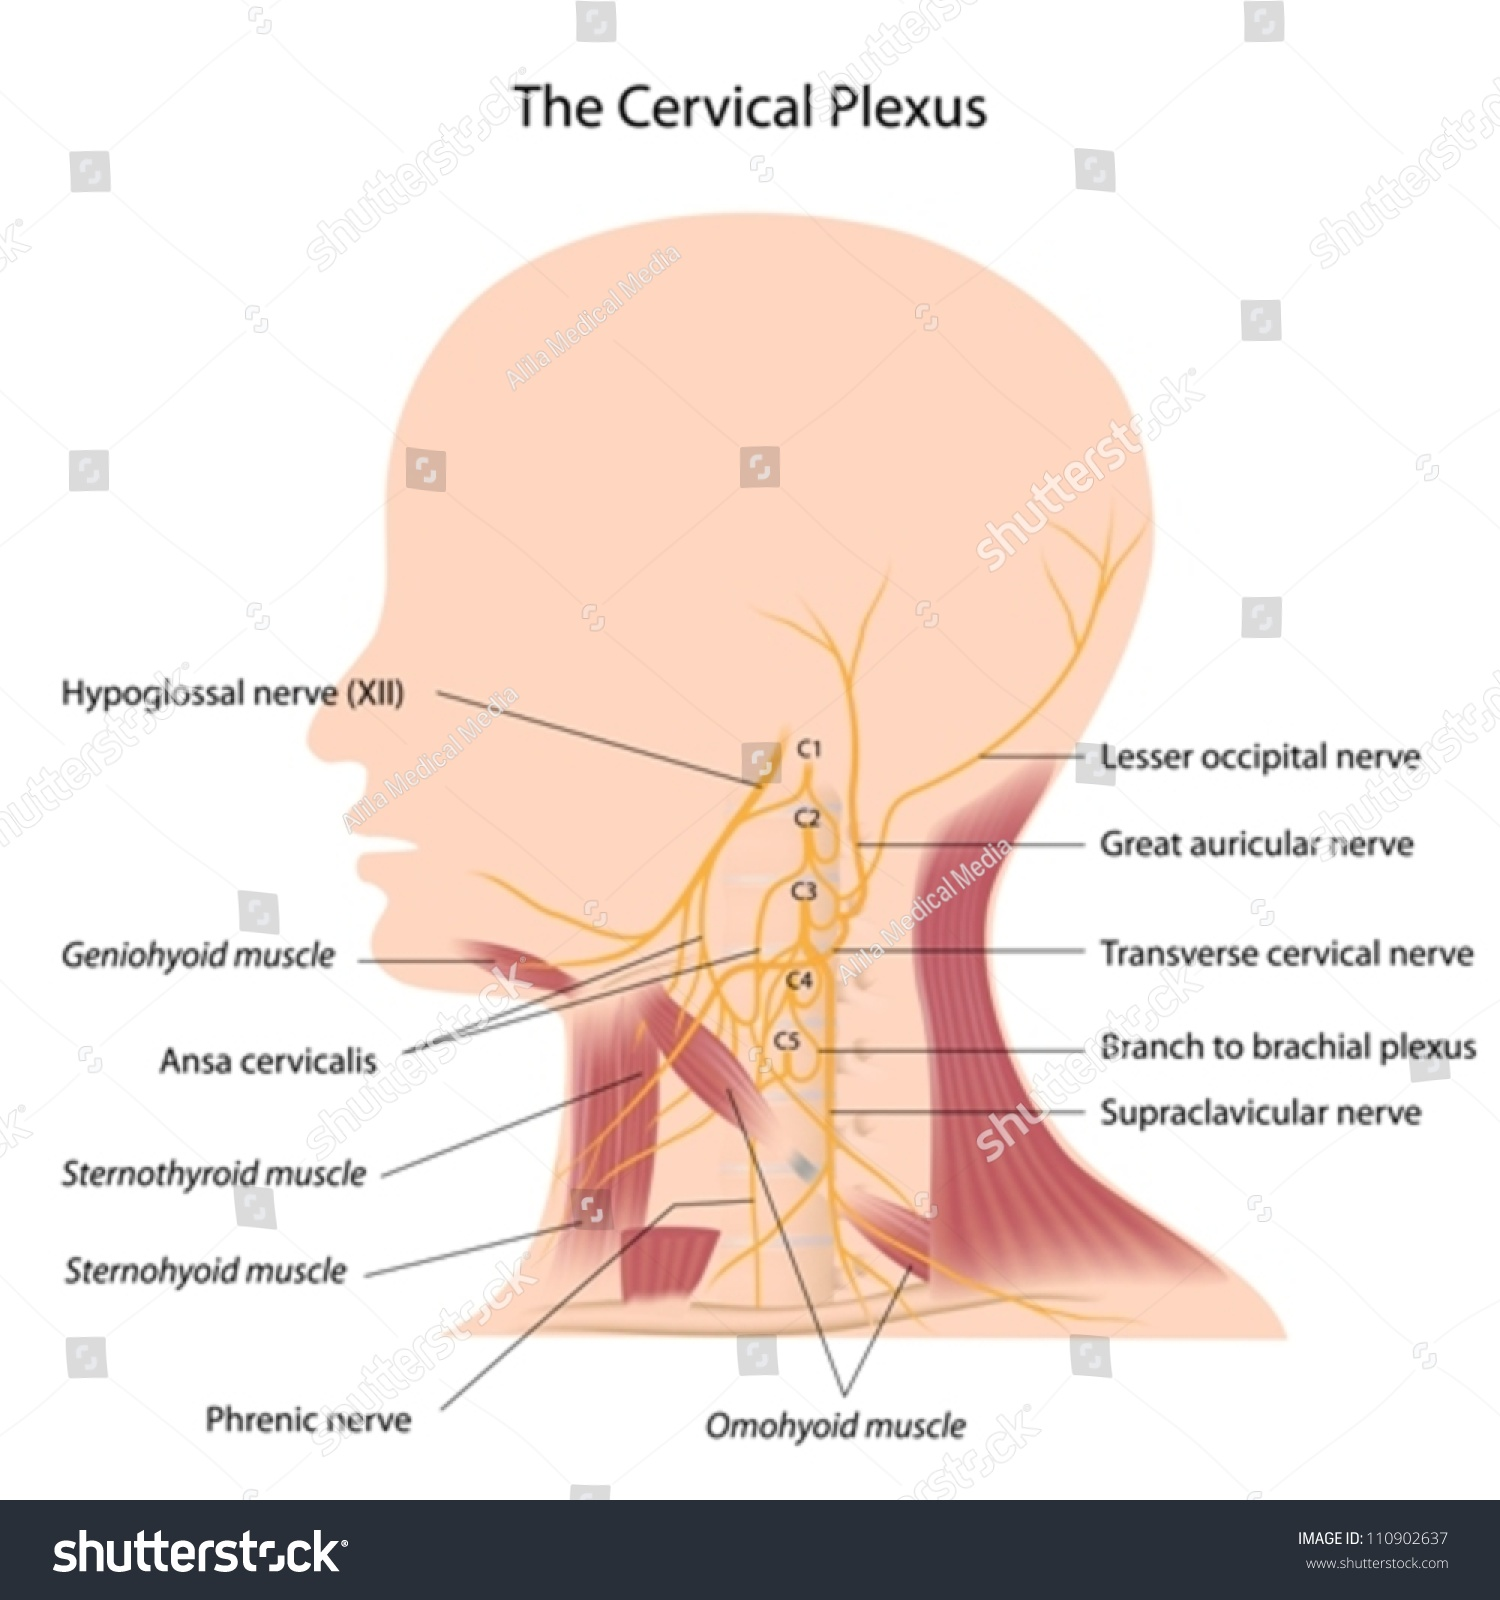 Cervical Plexus Stock Photo (Photo, Vector, Illustration) 110902637 ...